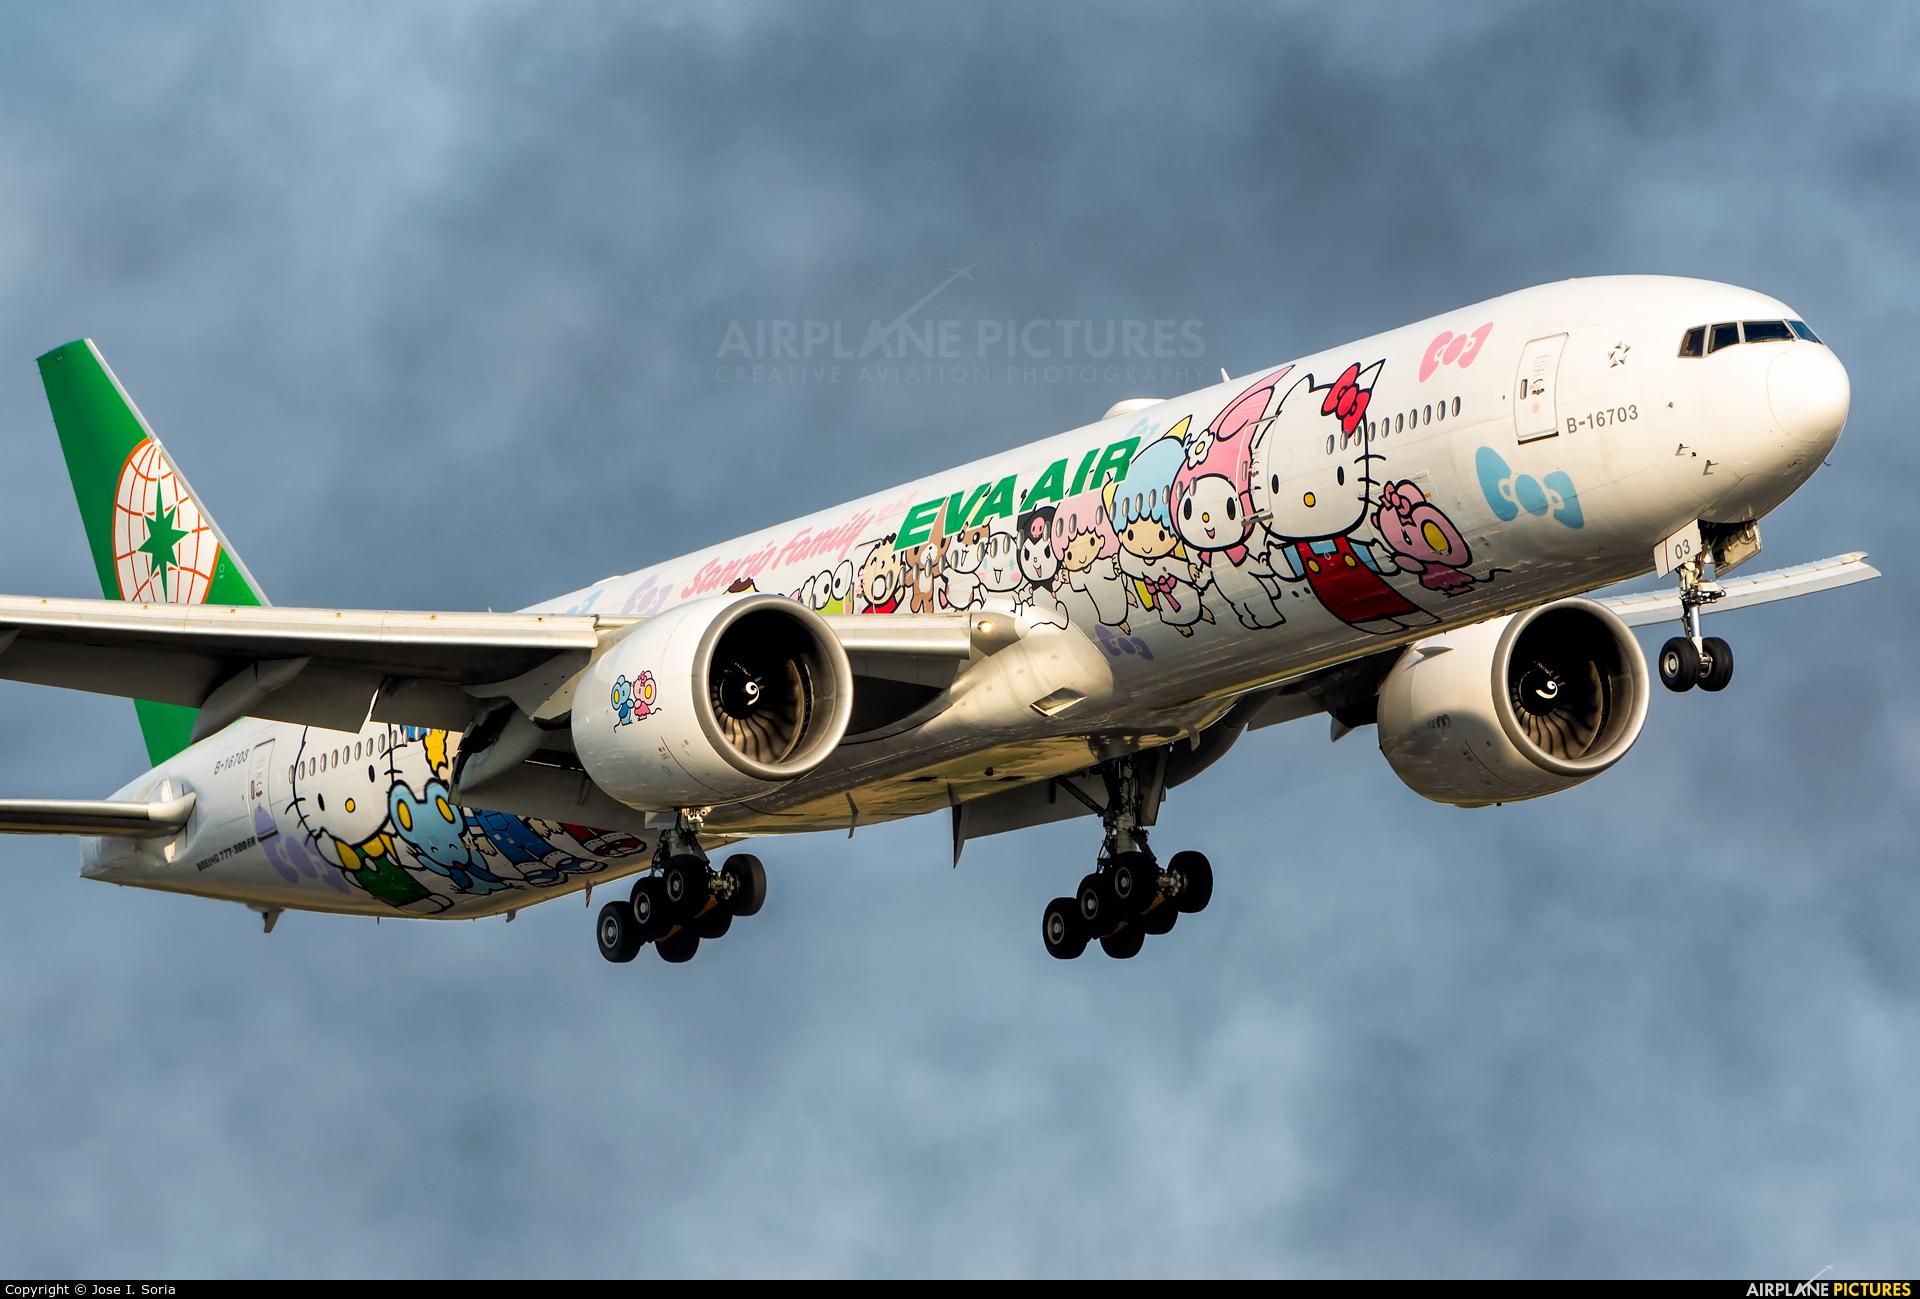 Eva Air B-16703 aircraft at London - Heathrow